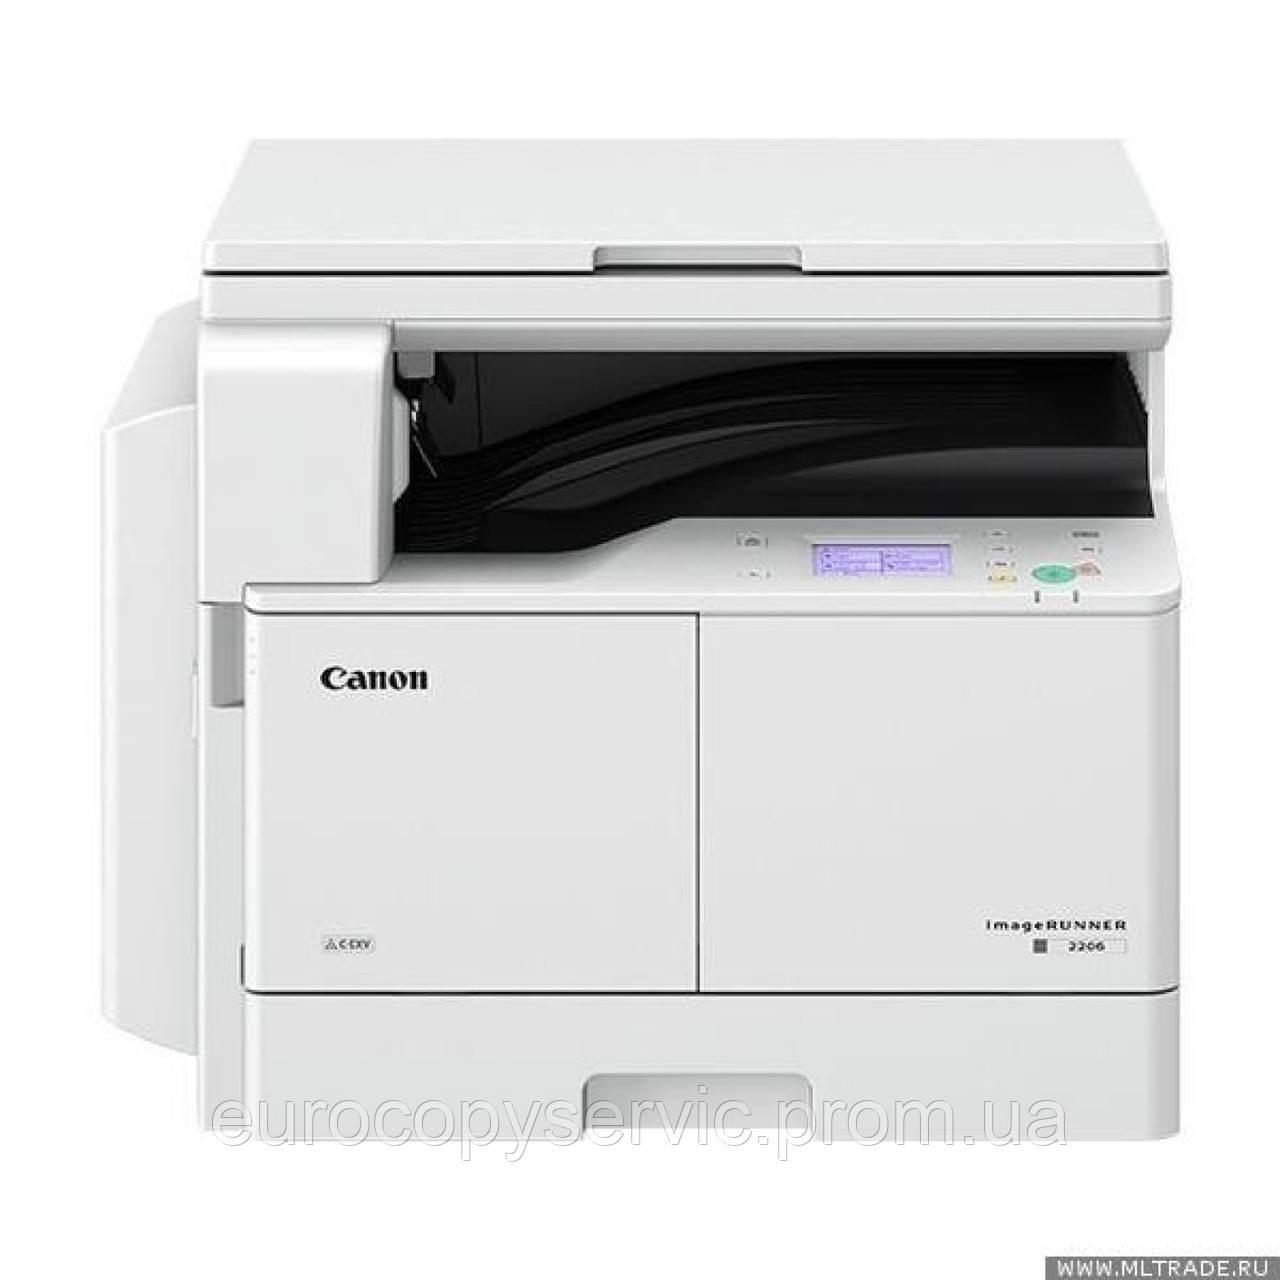 БФП А3 ч/б Canon iR2206n (3029C003) з Wi-Fi